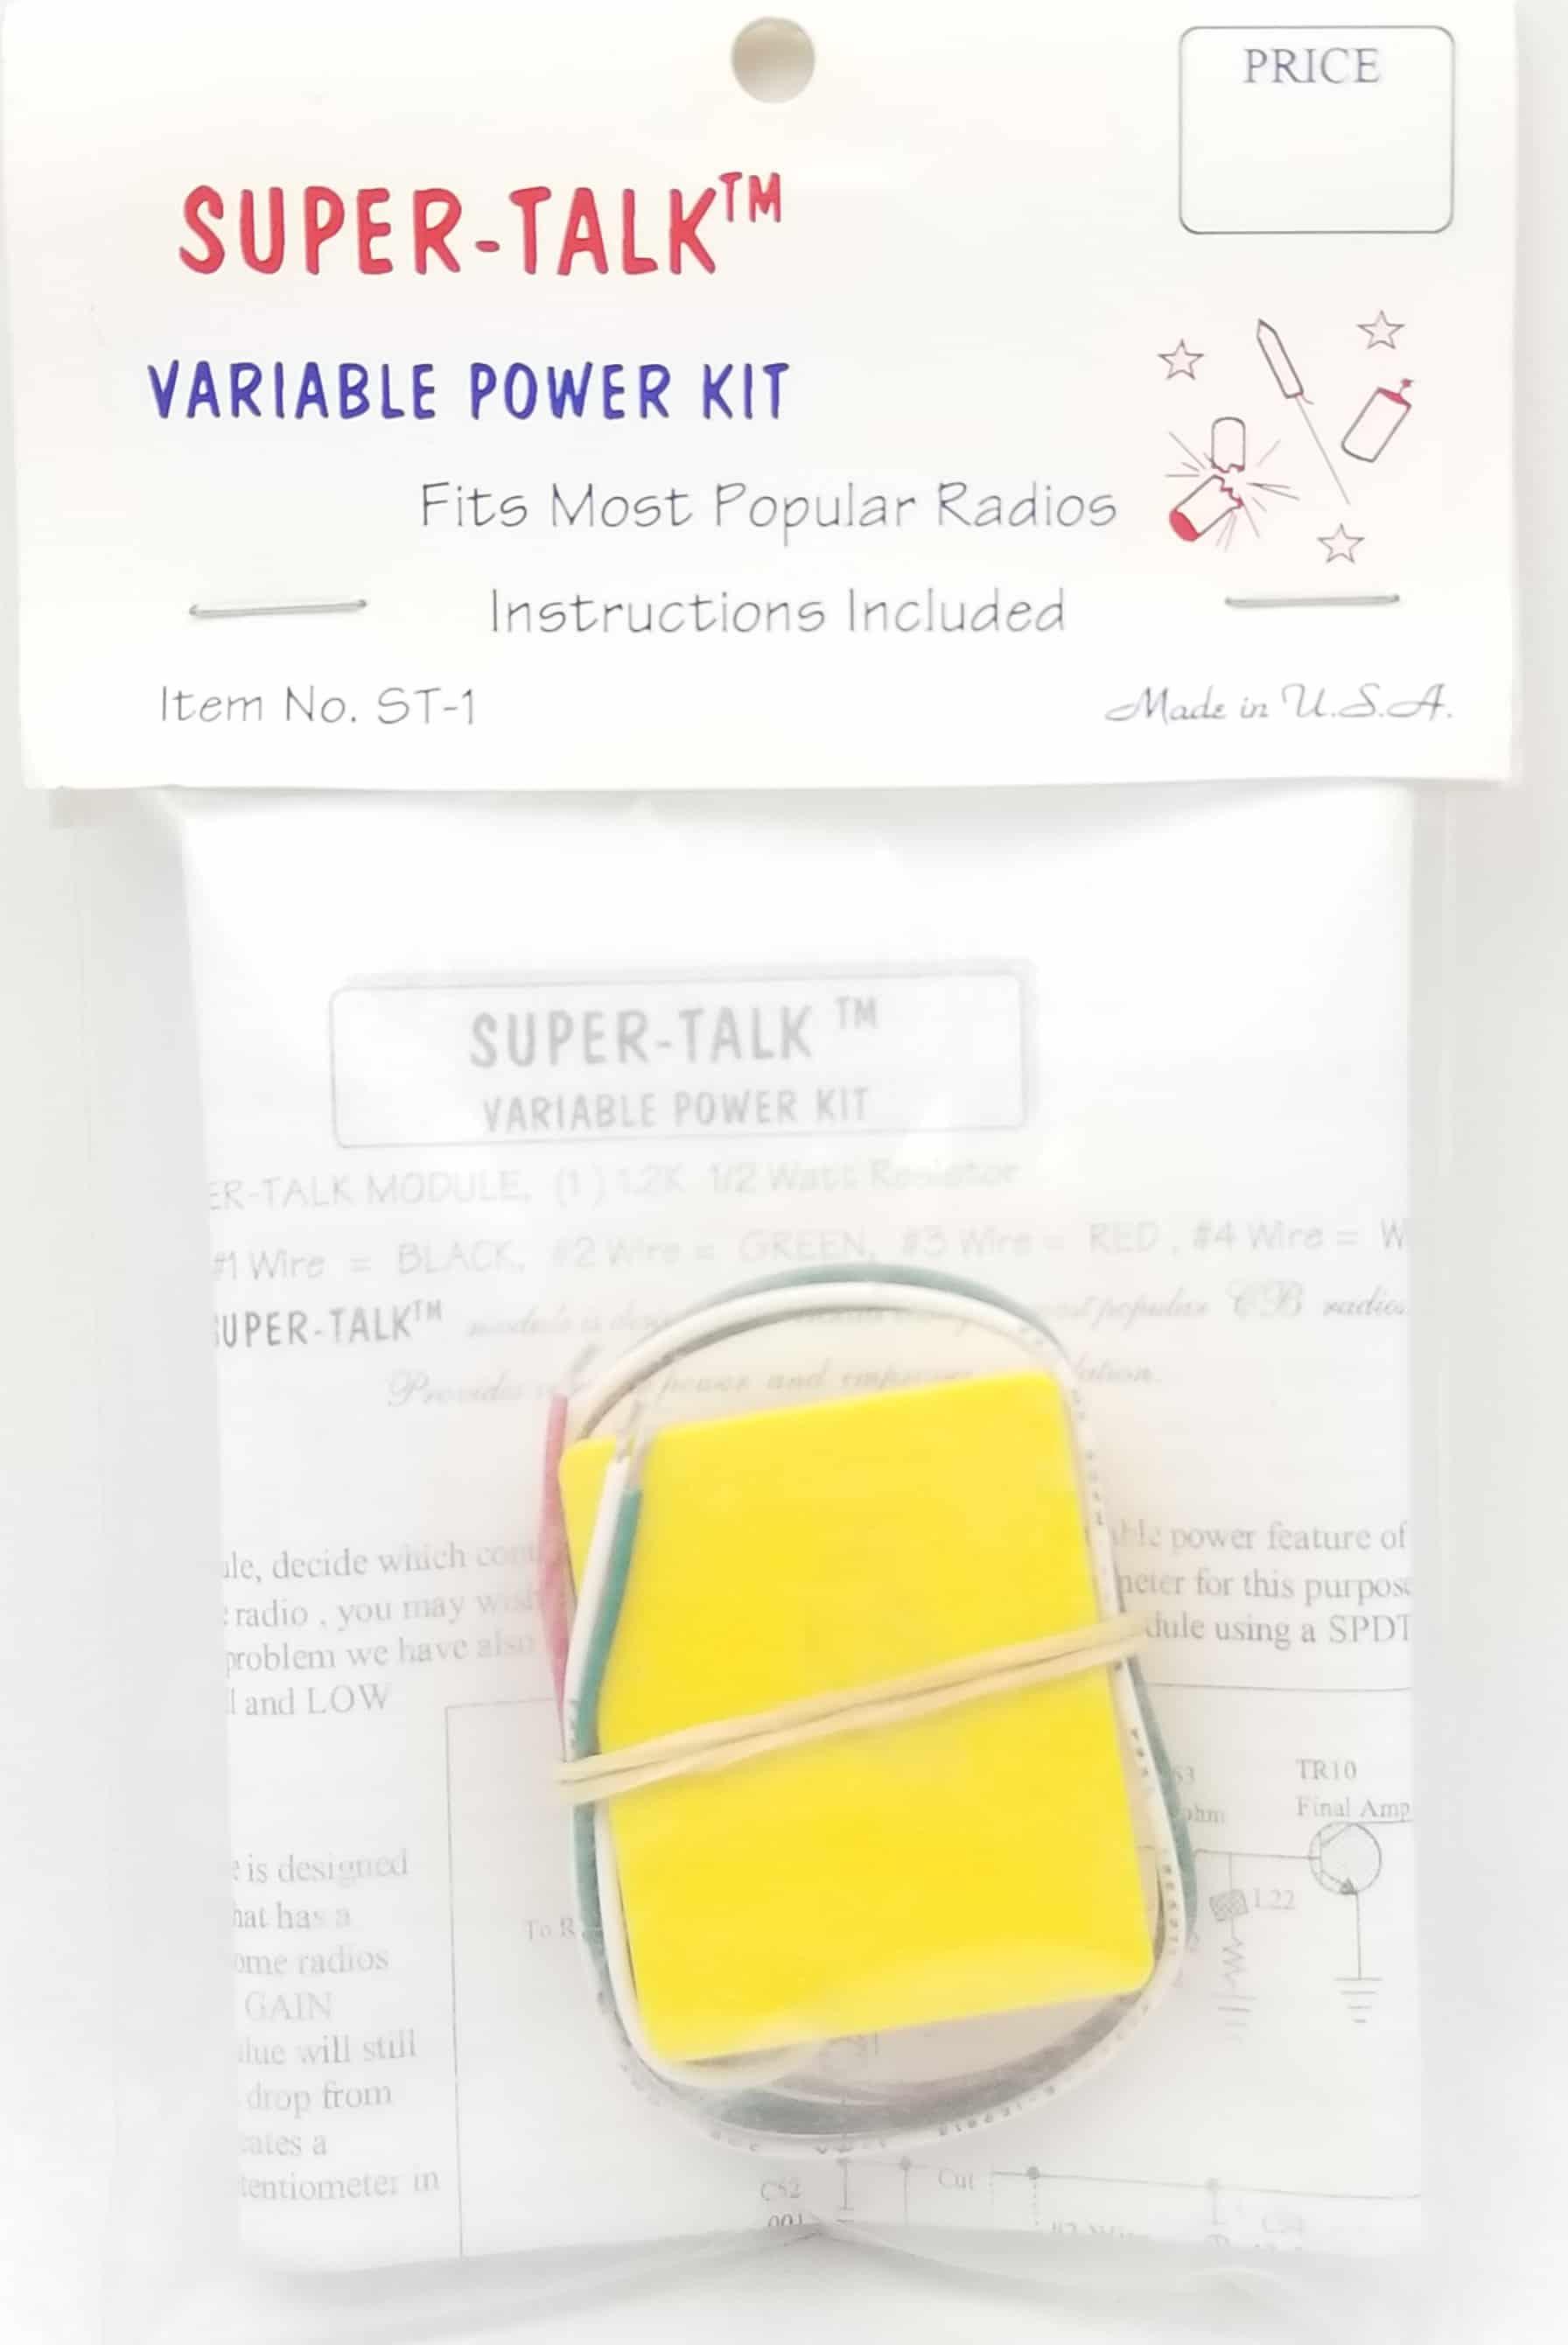 STK - Super Talk Variable Power Kit